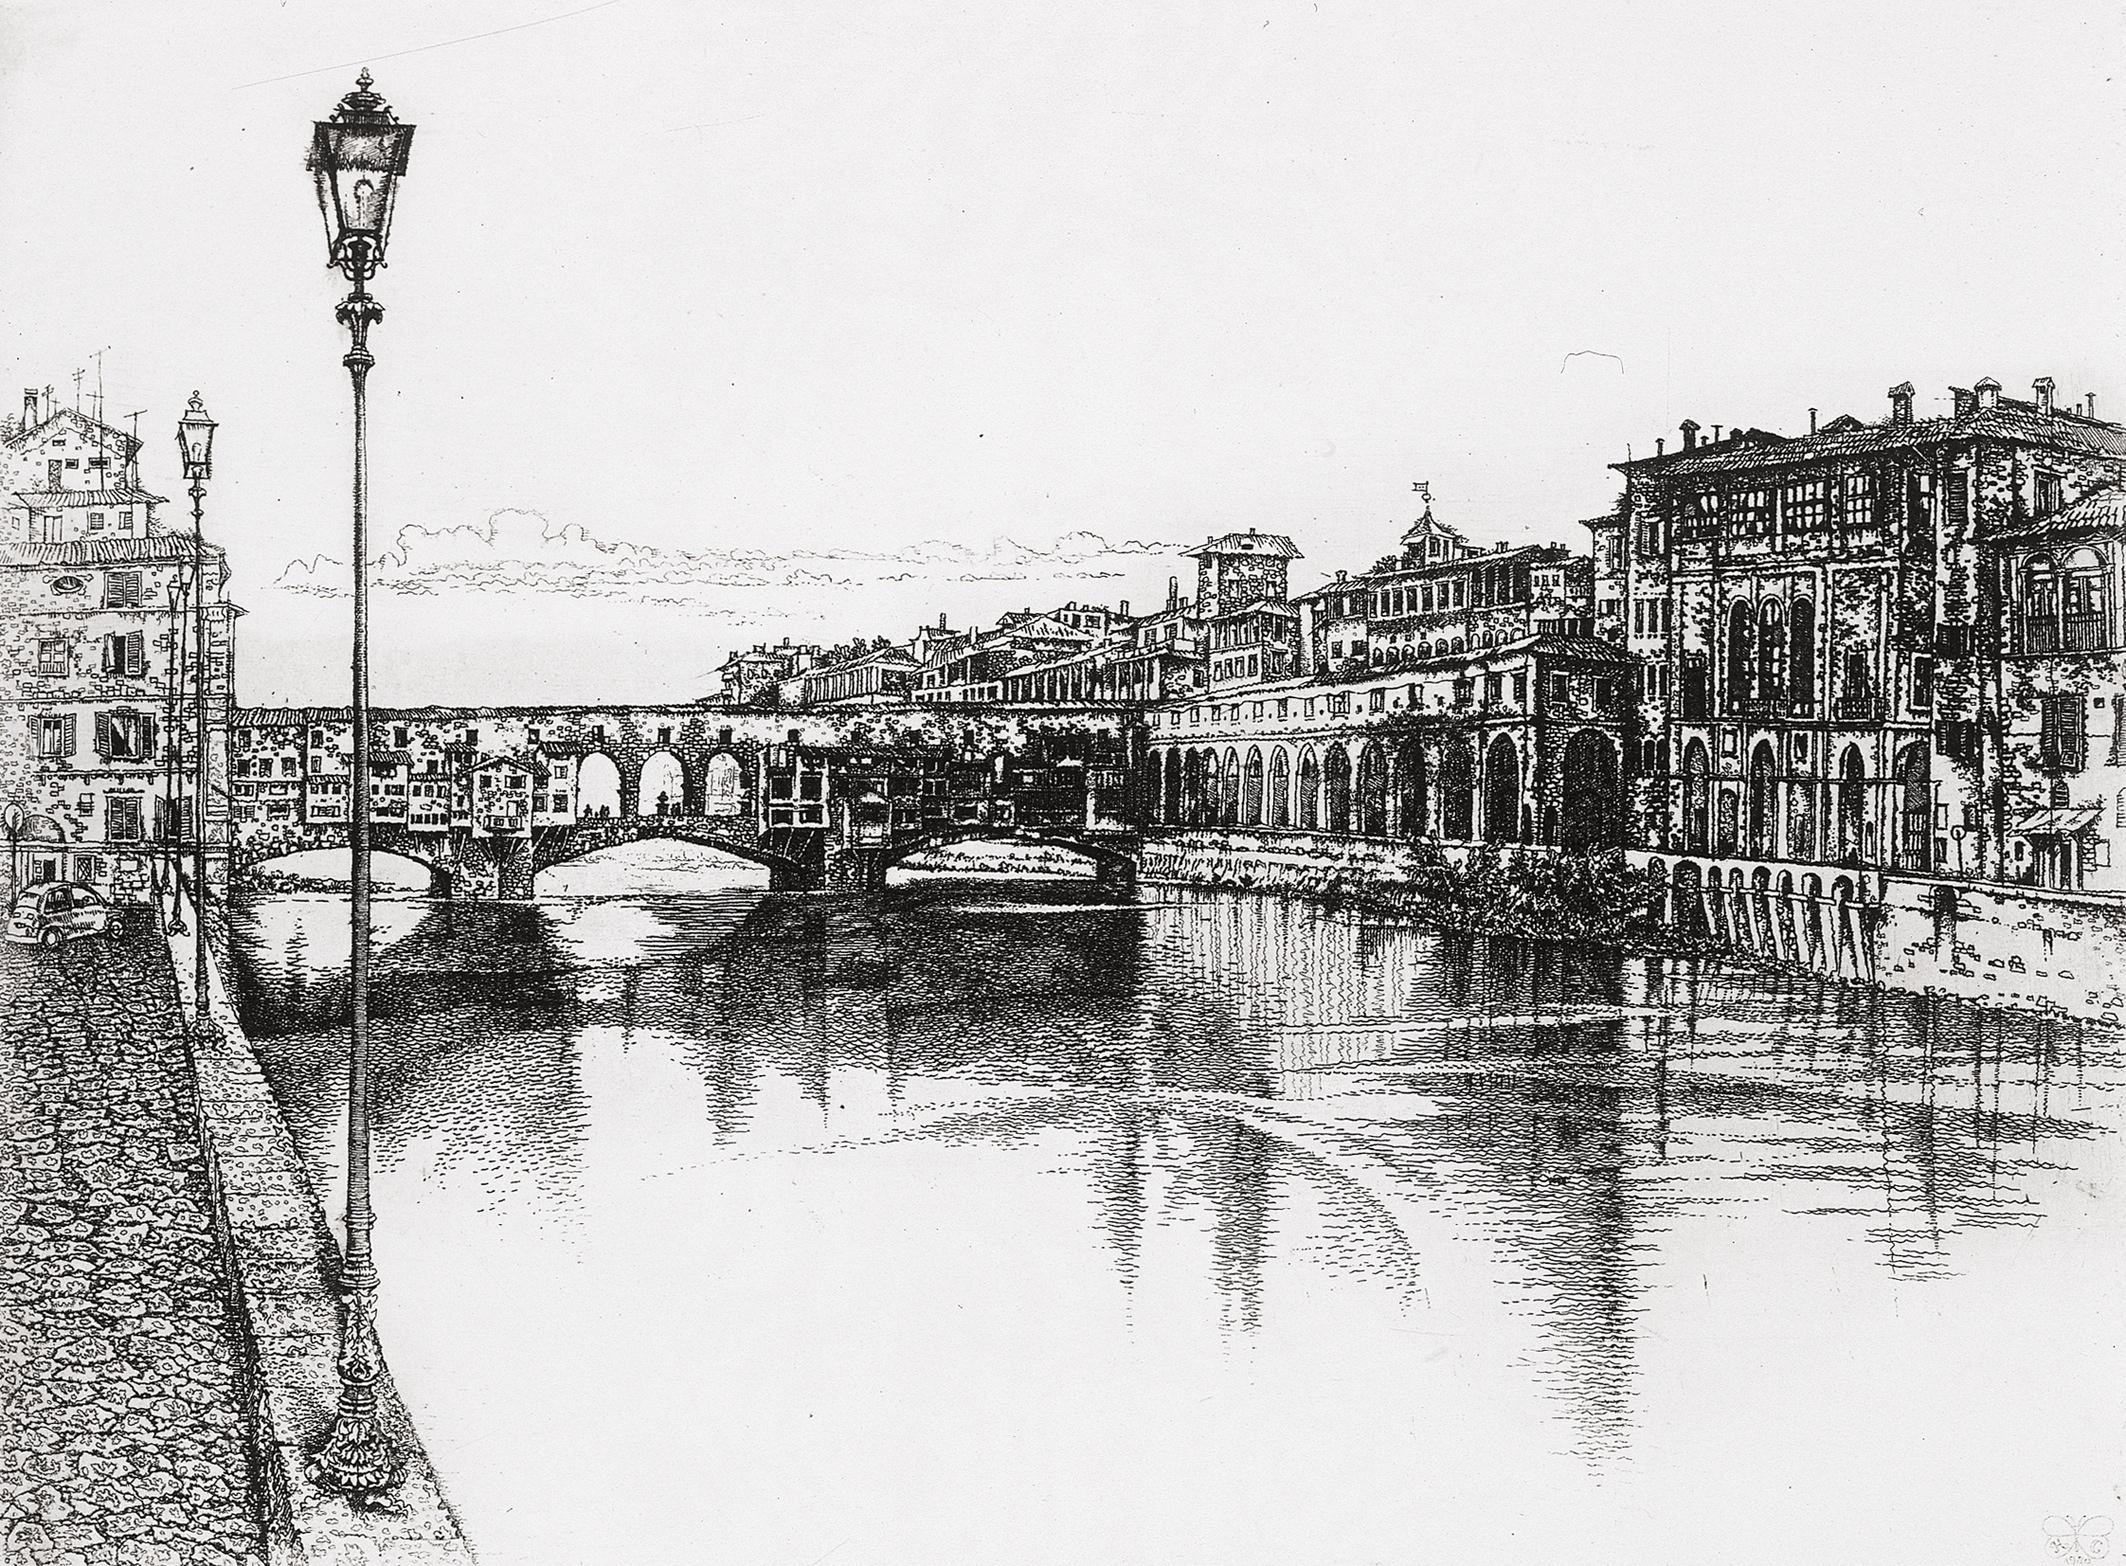 Arno River. Florence